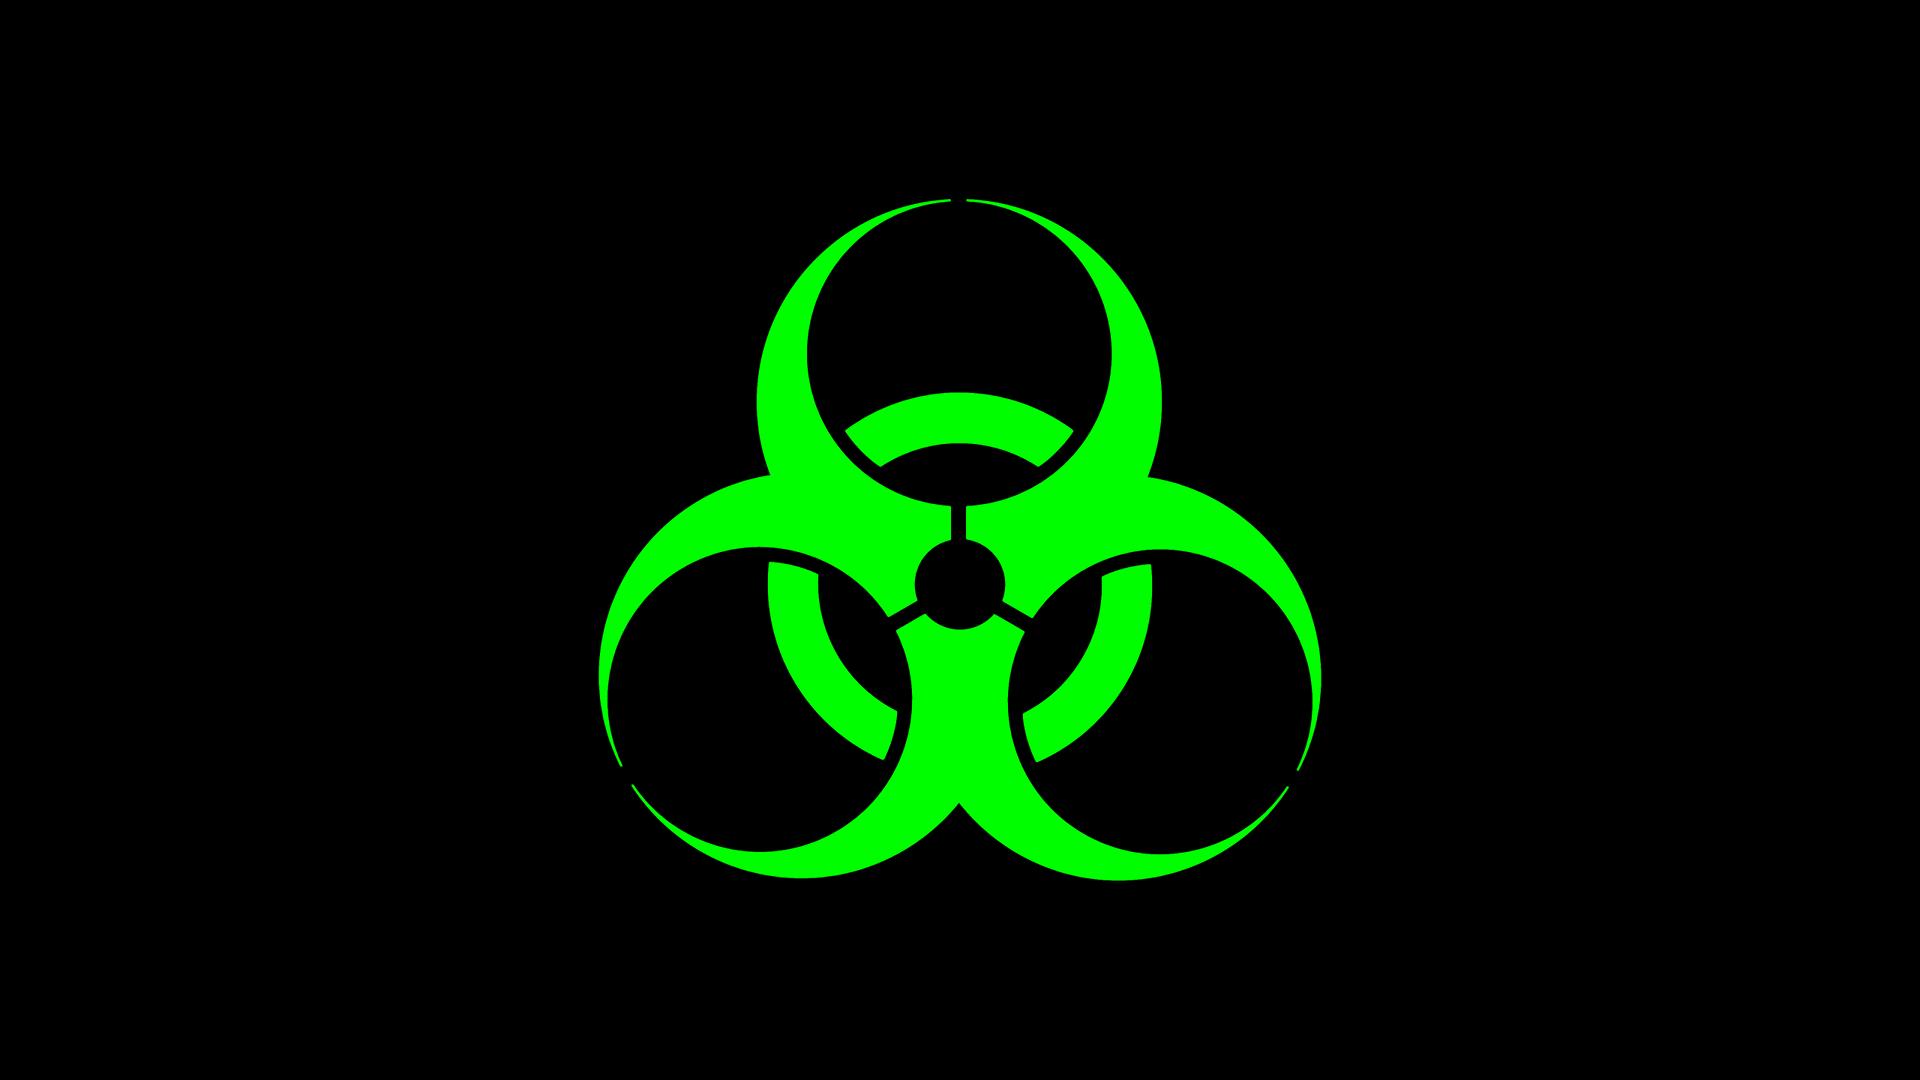 Zombie Biohazard Symbol Wallpaper   Viewing Gallery 1920x1080